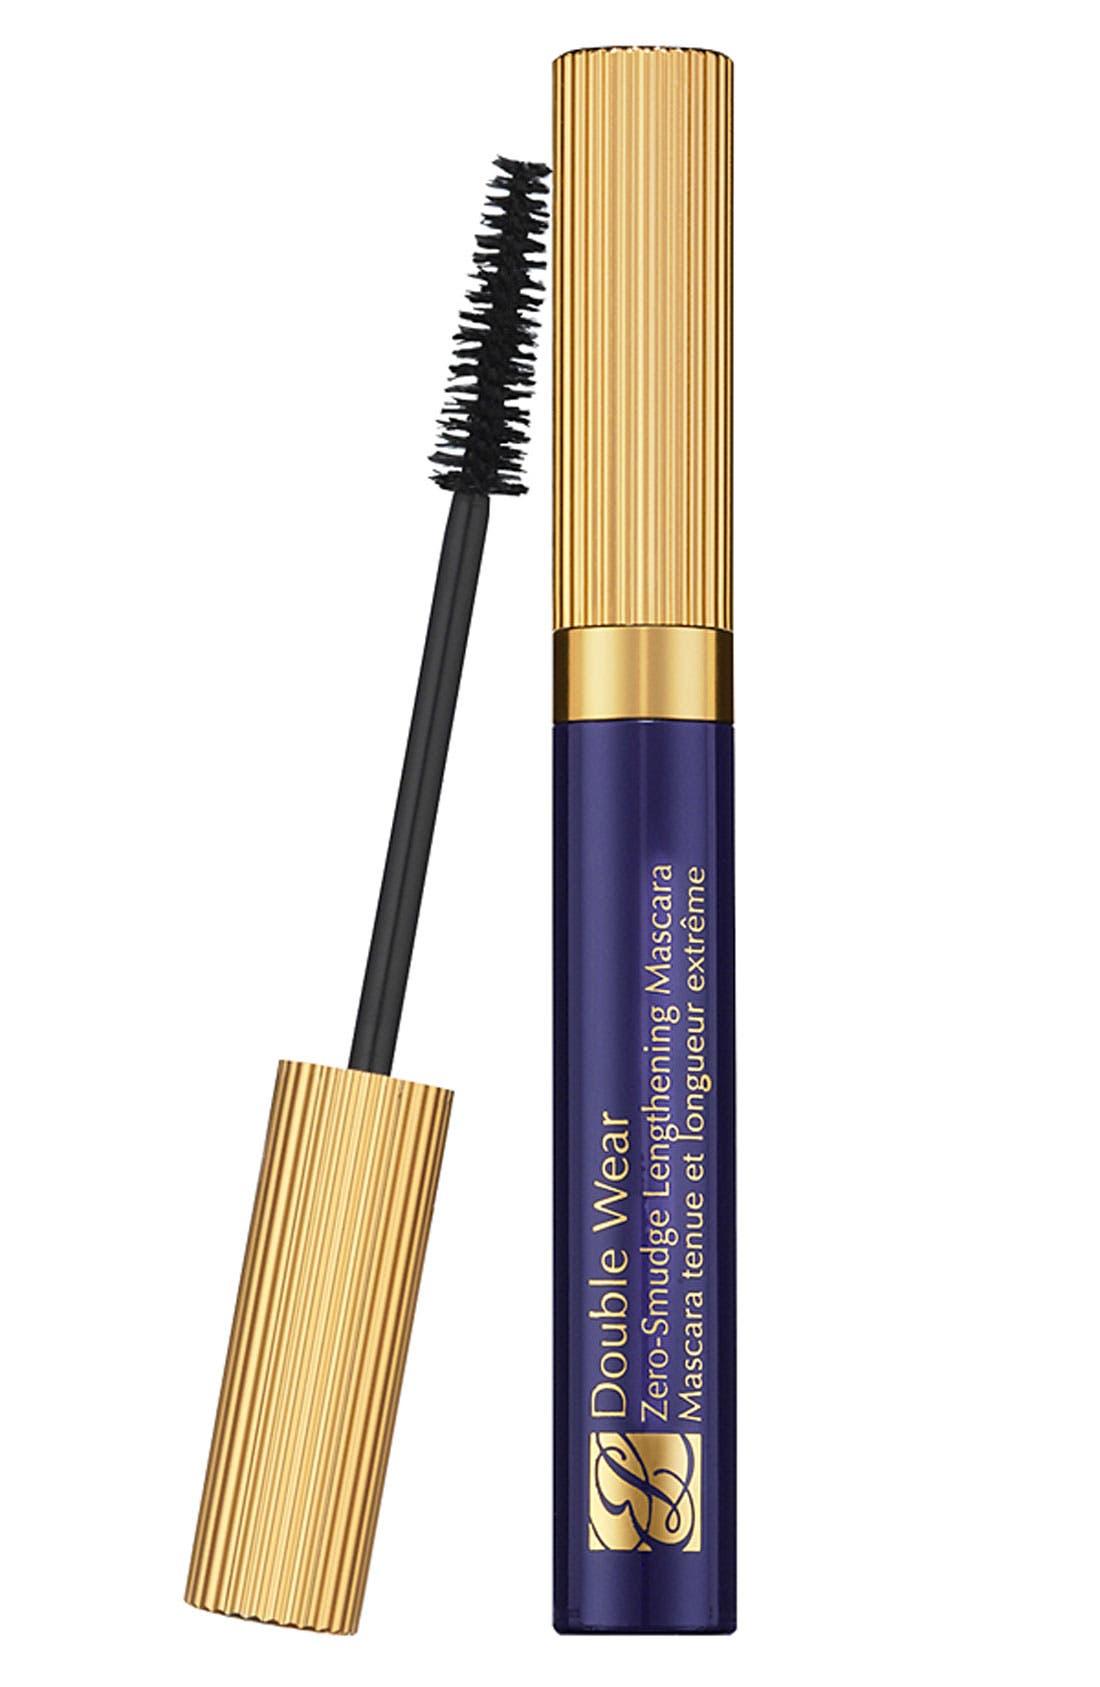 Estee Lauder Double Wear Zero-Smudge Lengthening Mascara -